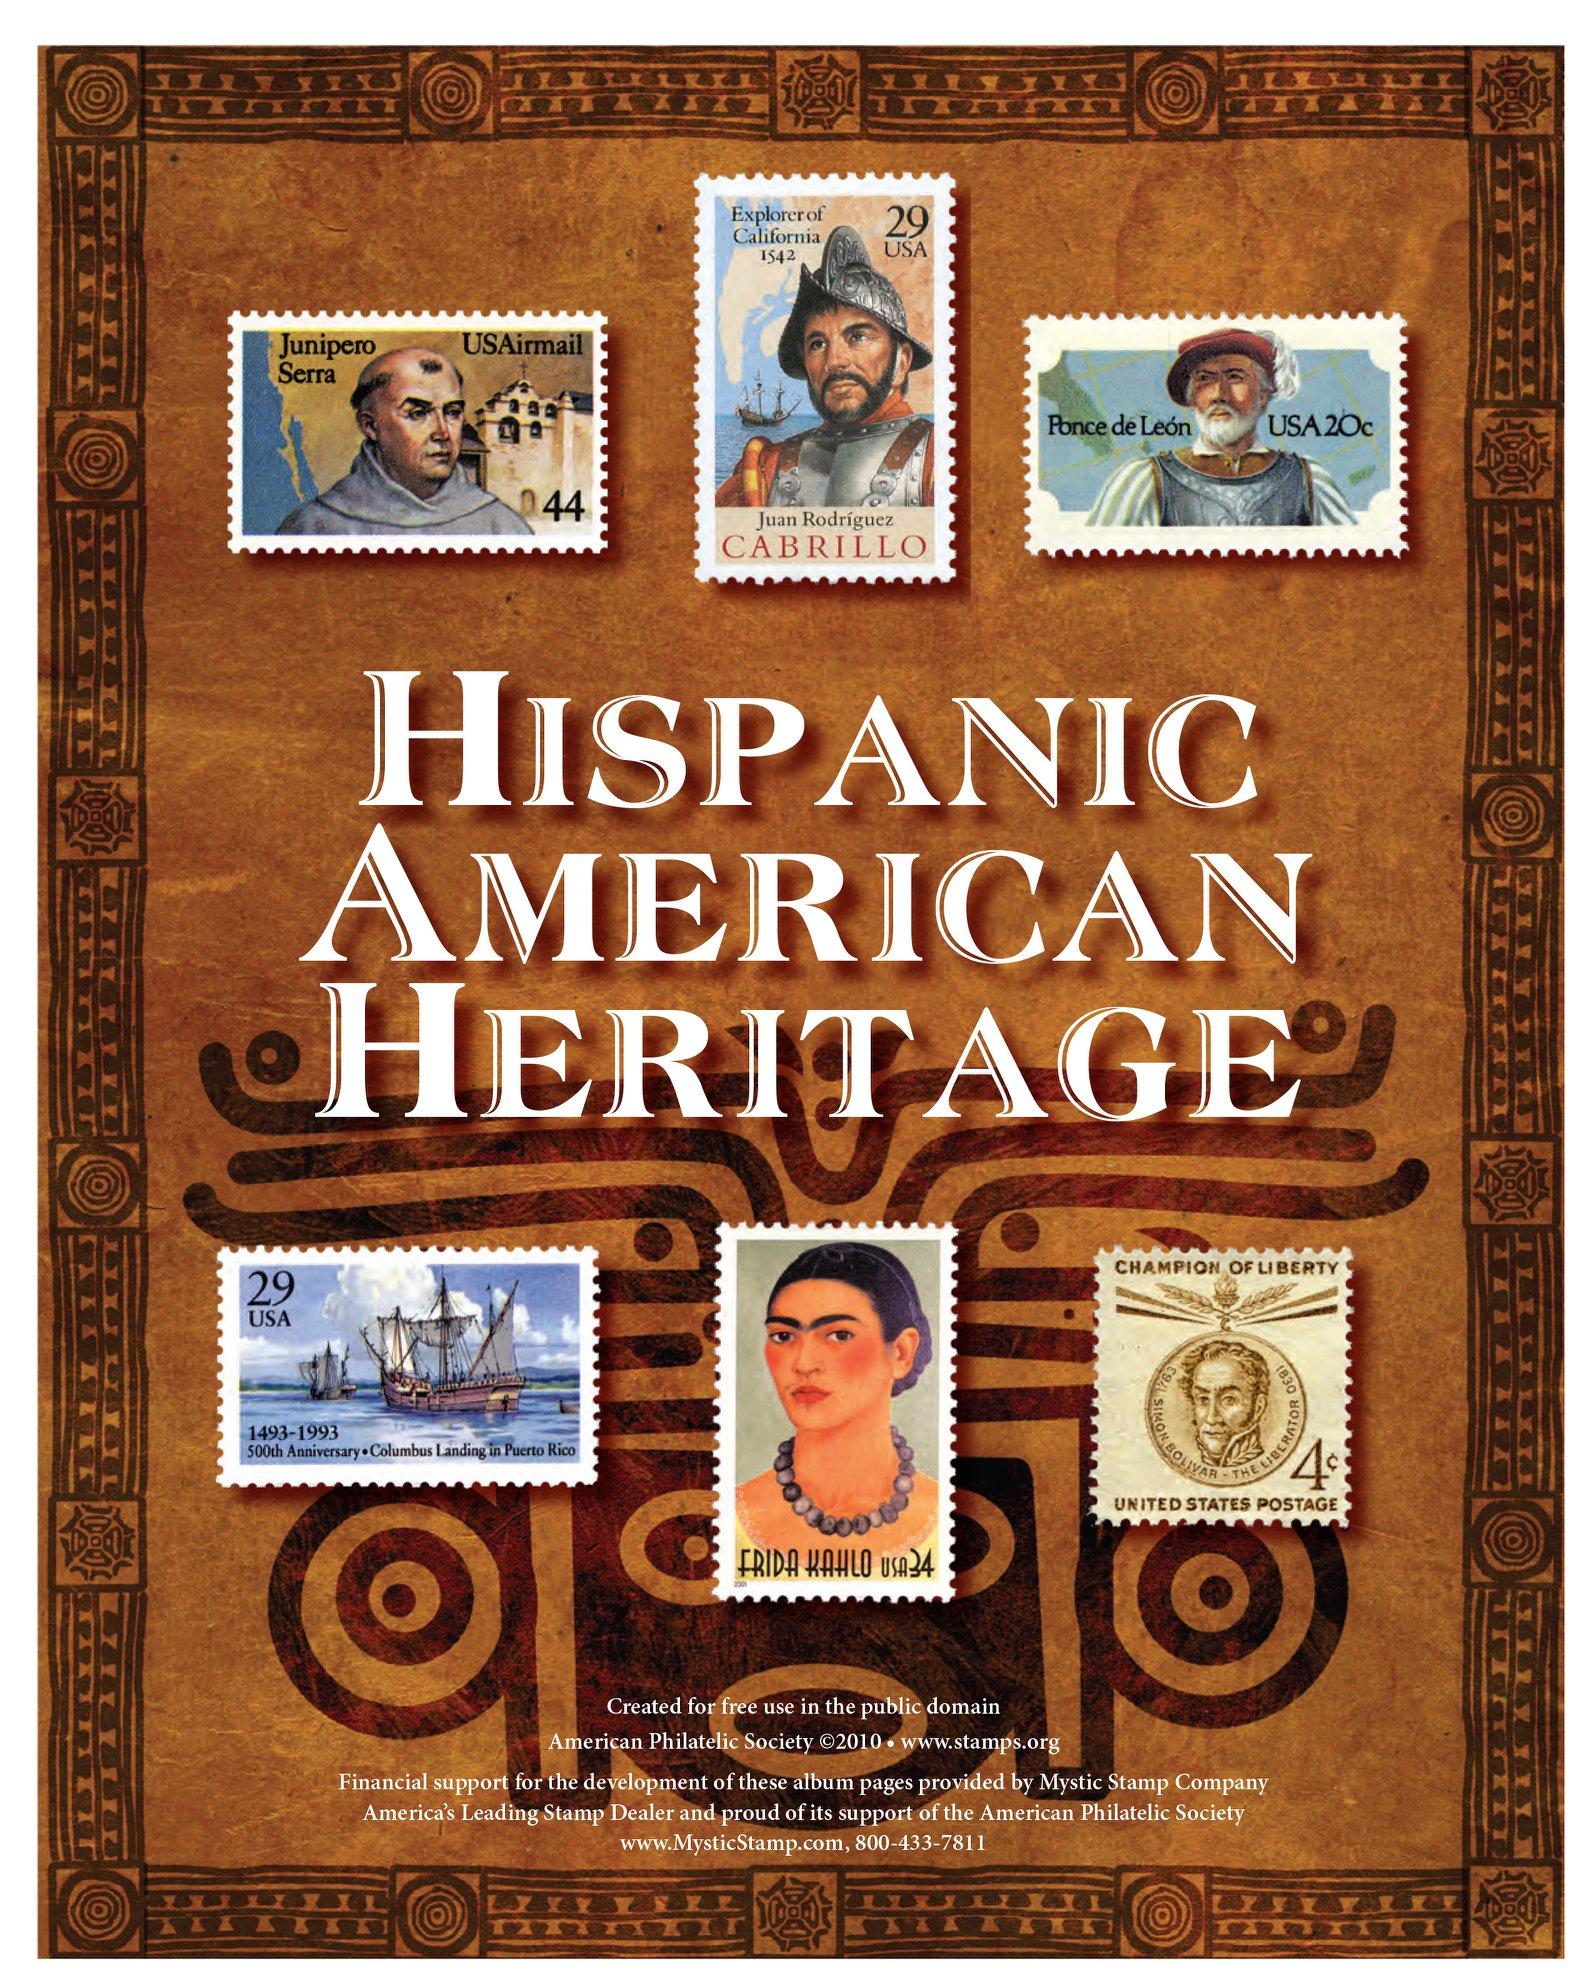 5 Creative Ways To Celebrate Hispanic Heritage Month On